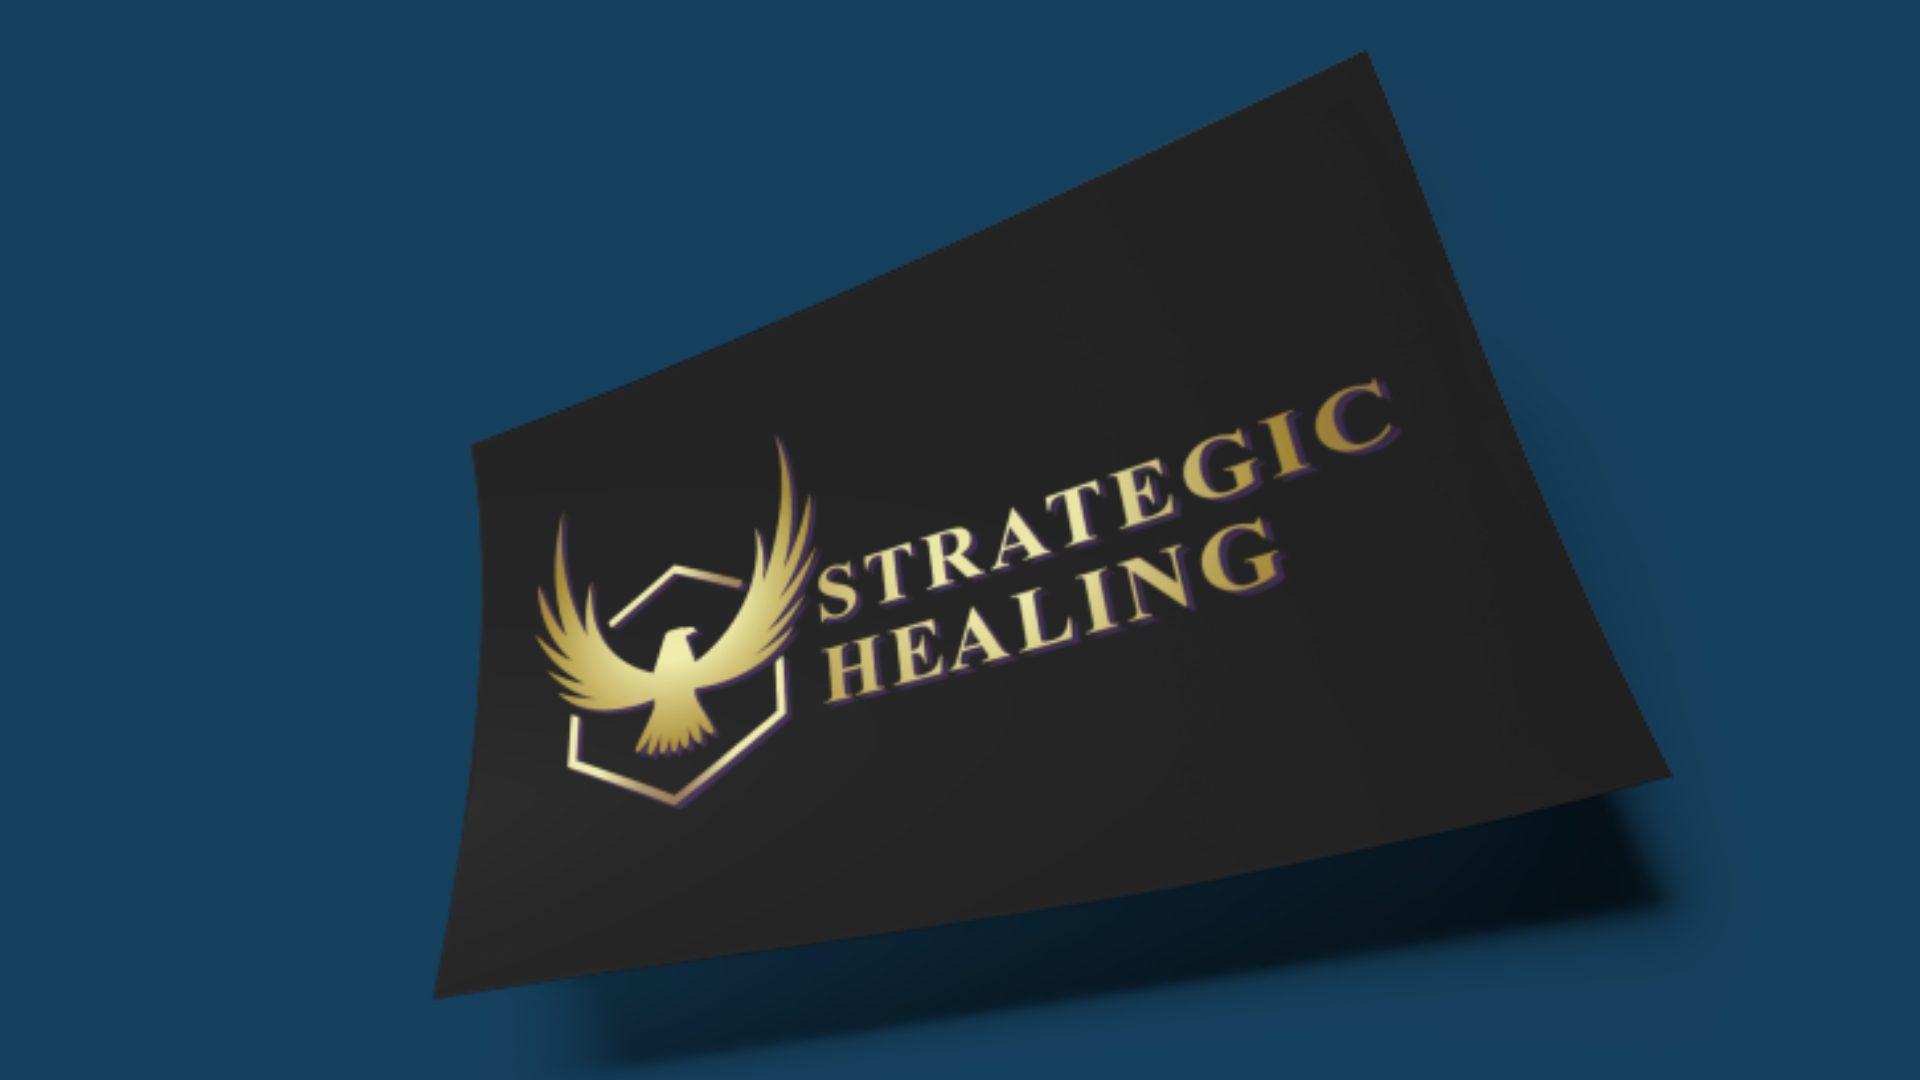 Strategic Healing - Eagle Logo Mockup 01